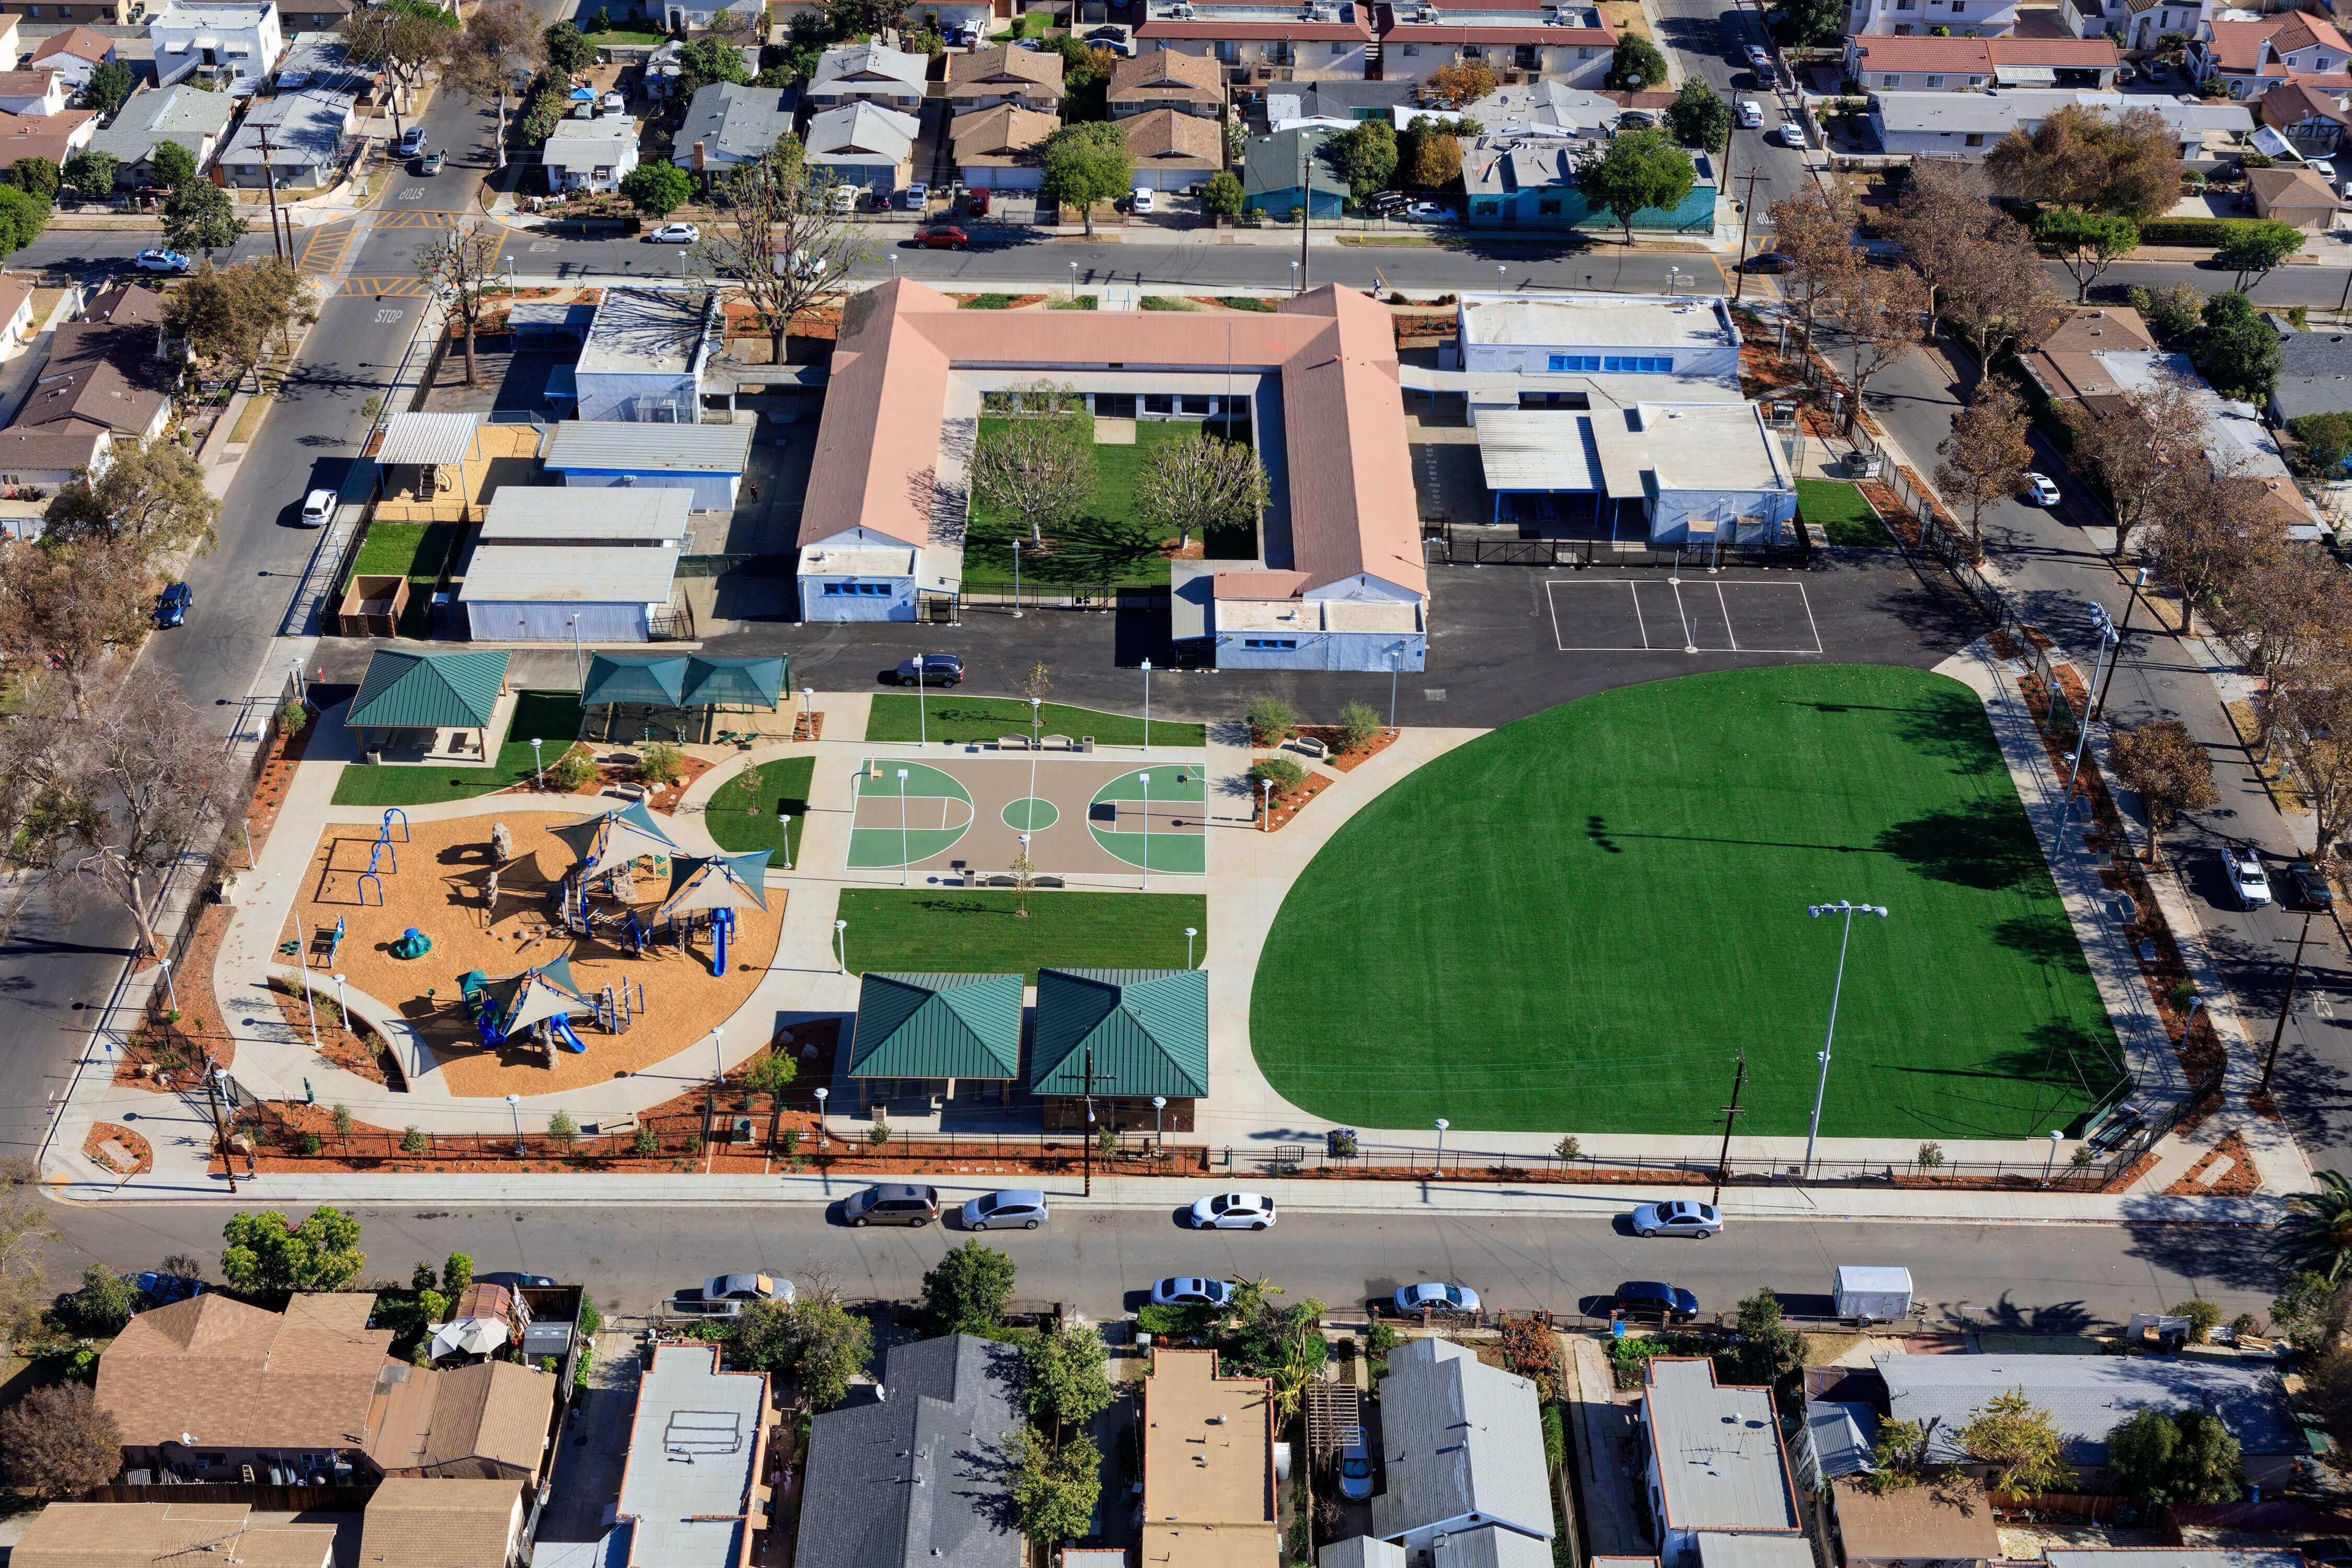 Marshall Community Park